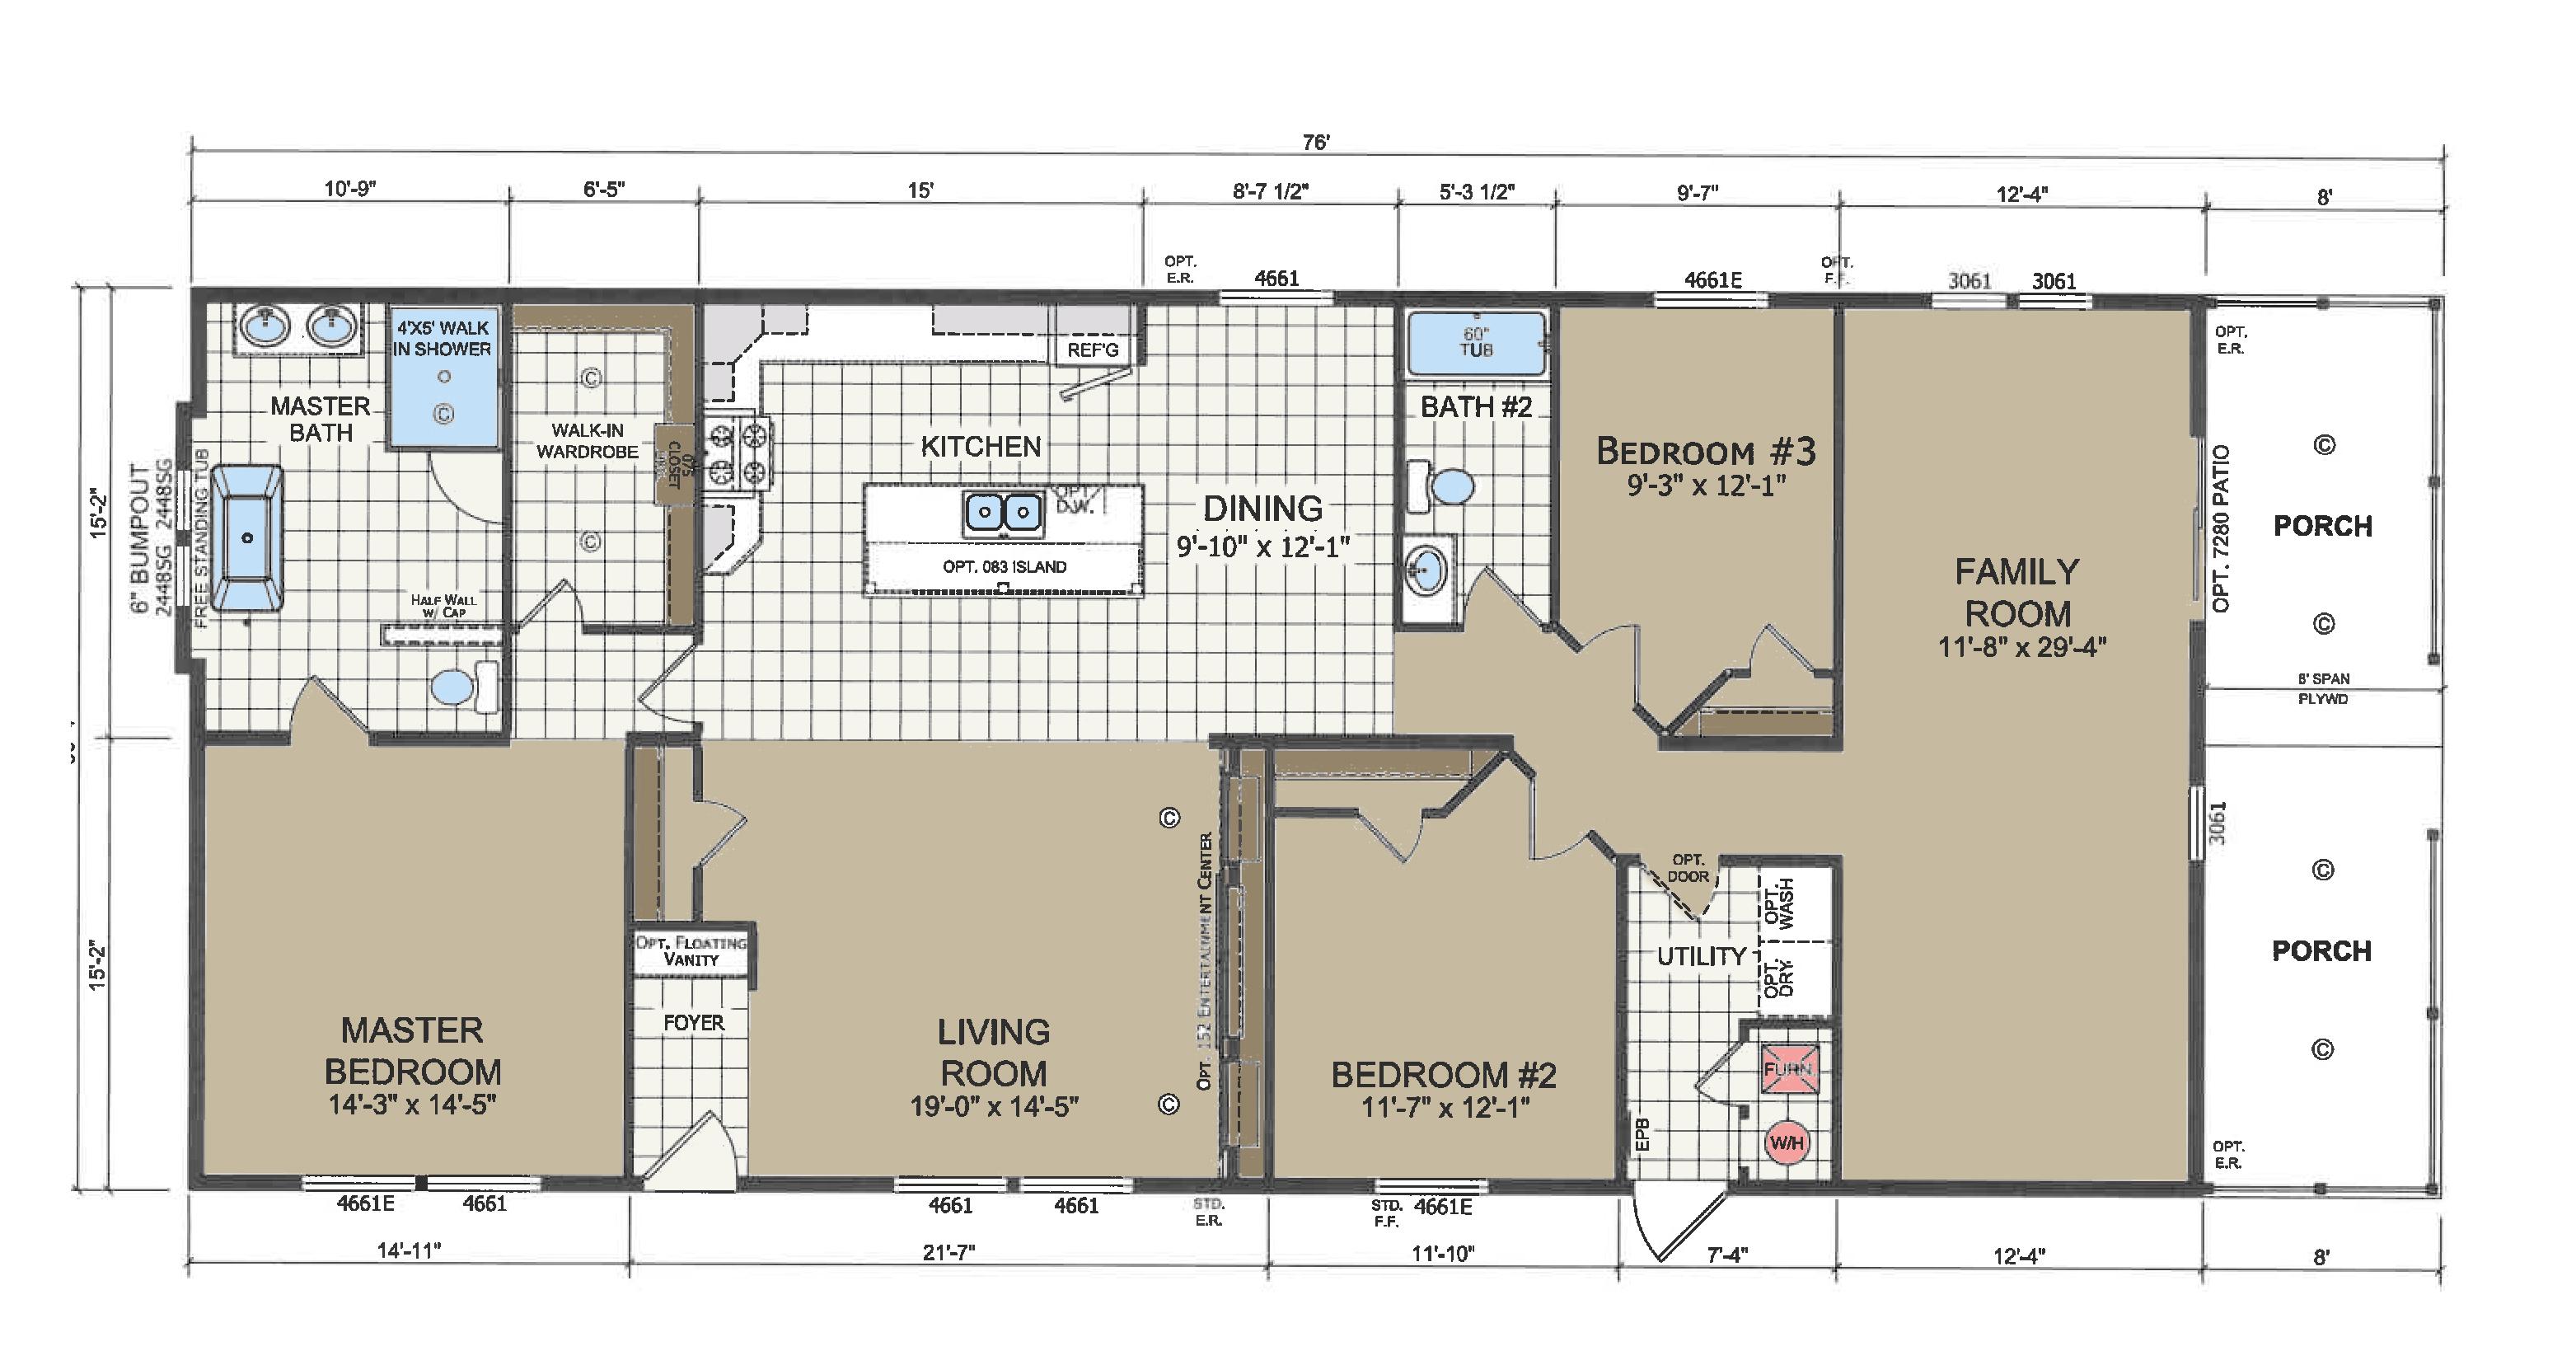 floorplan image for unit 348